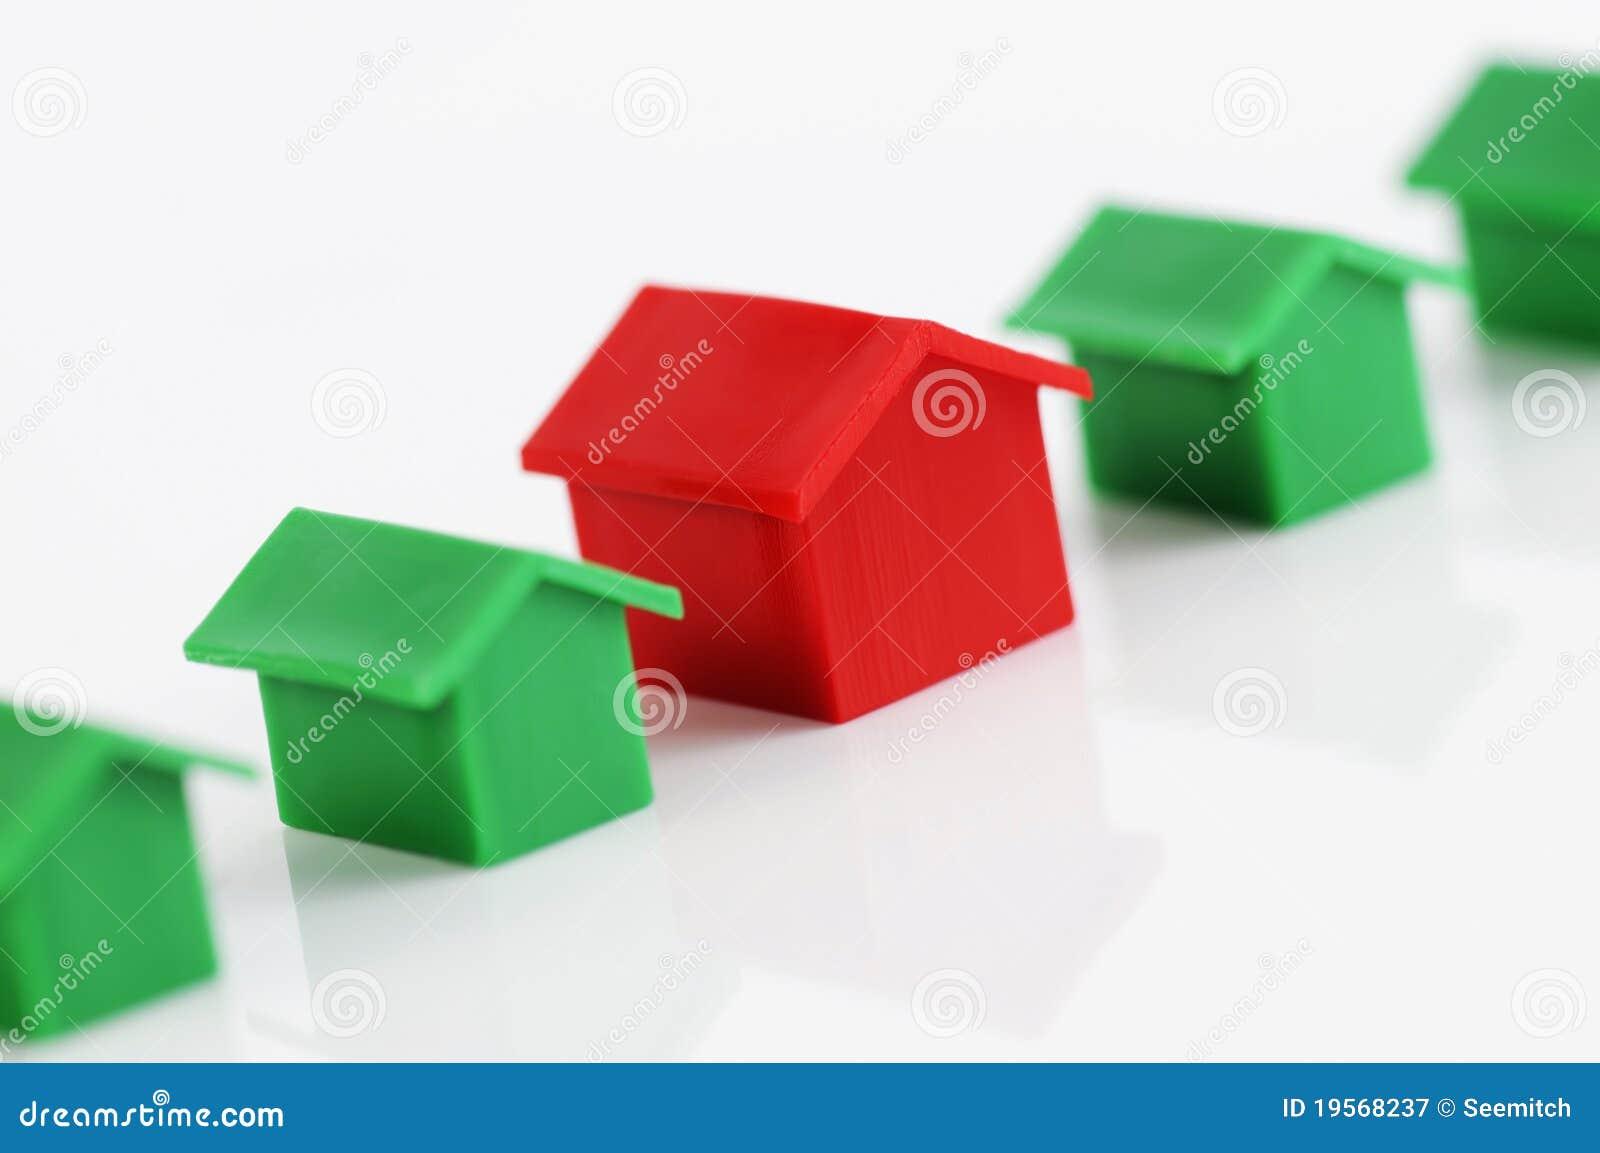 Row of model houses